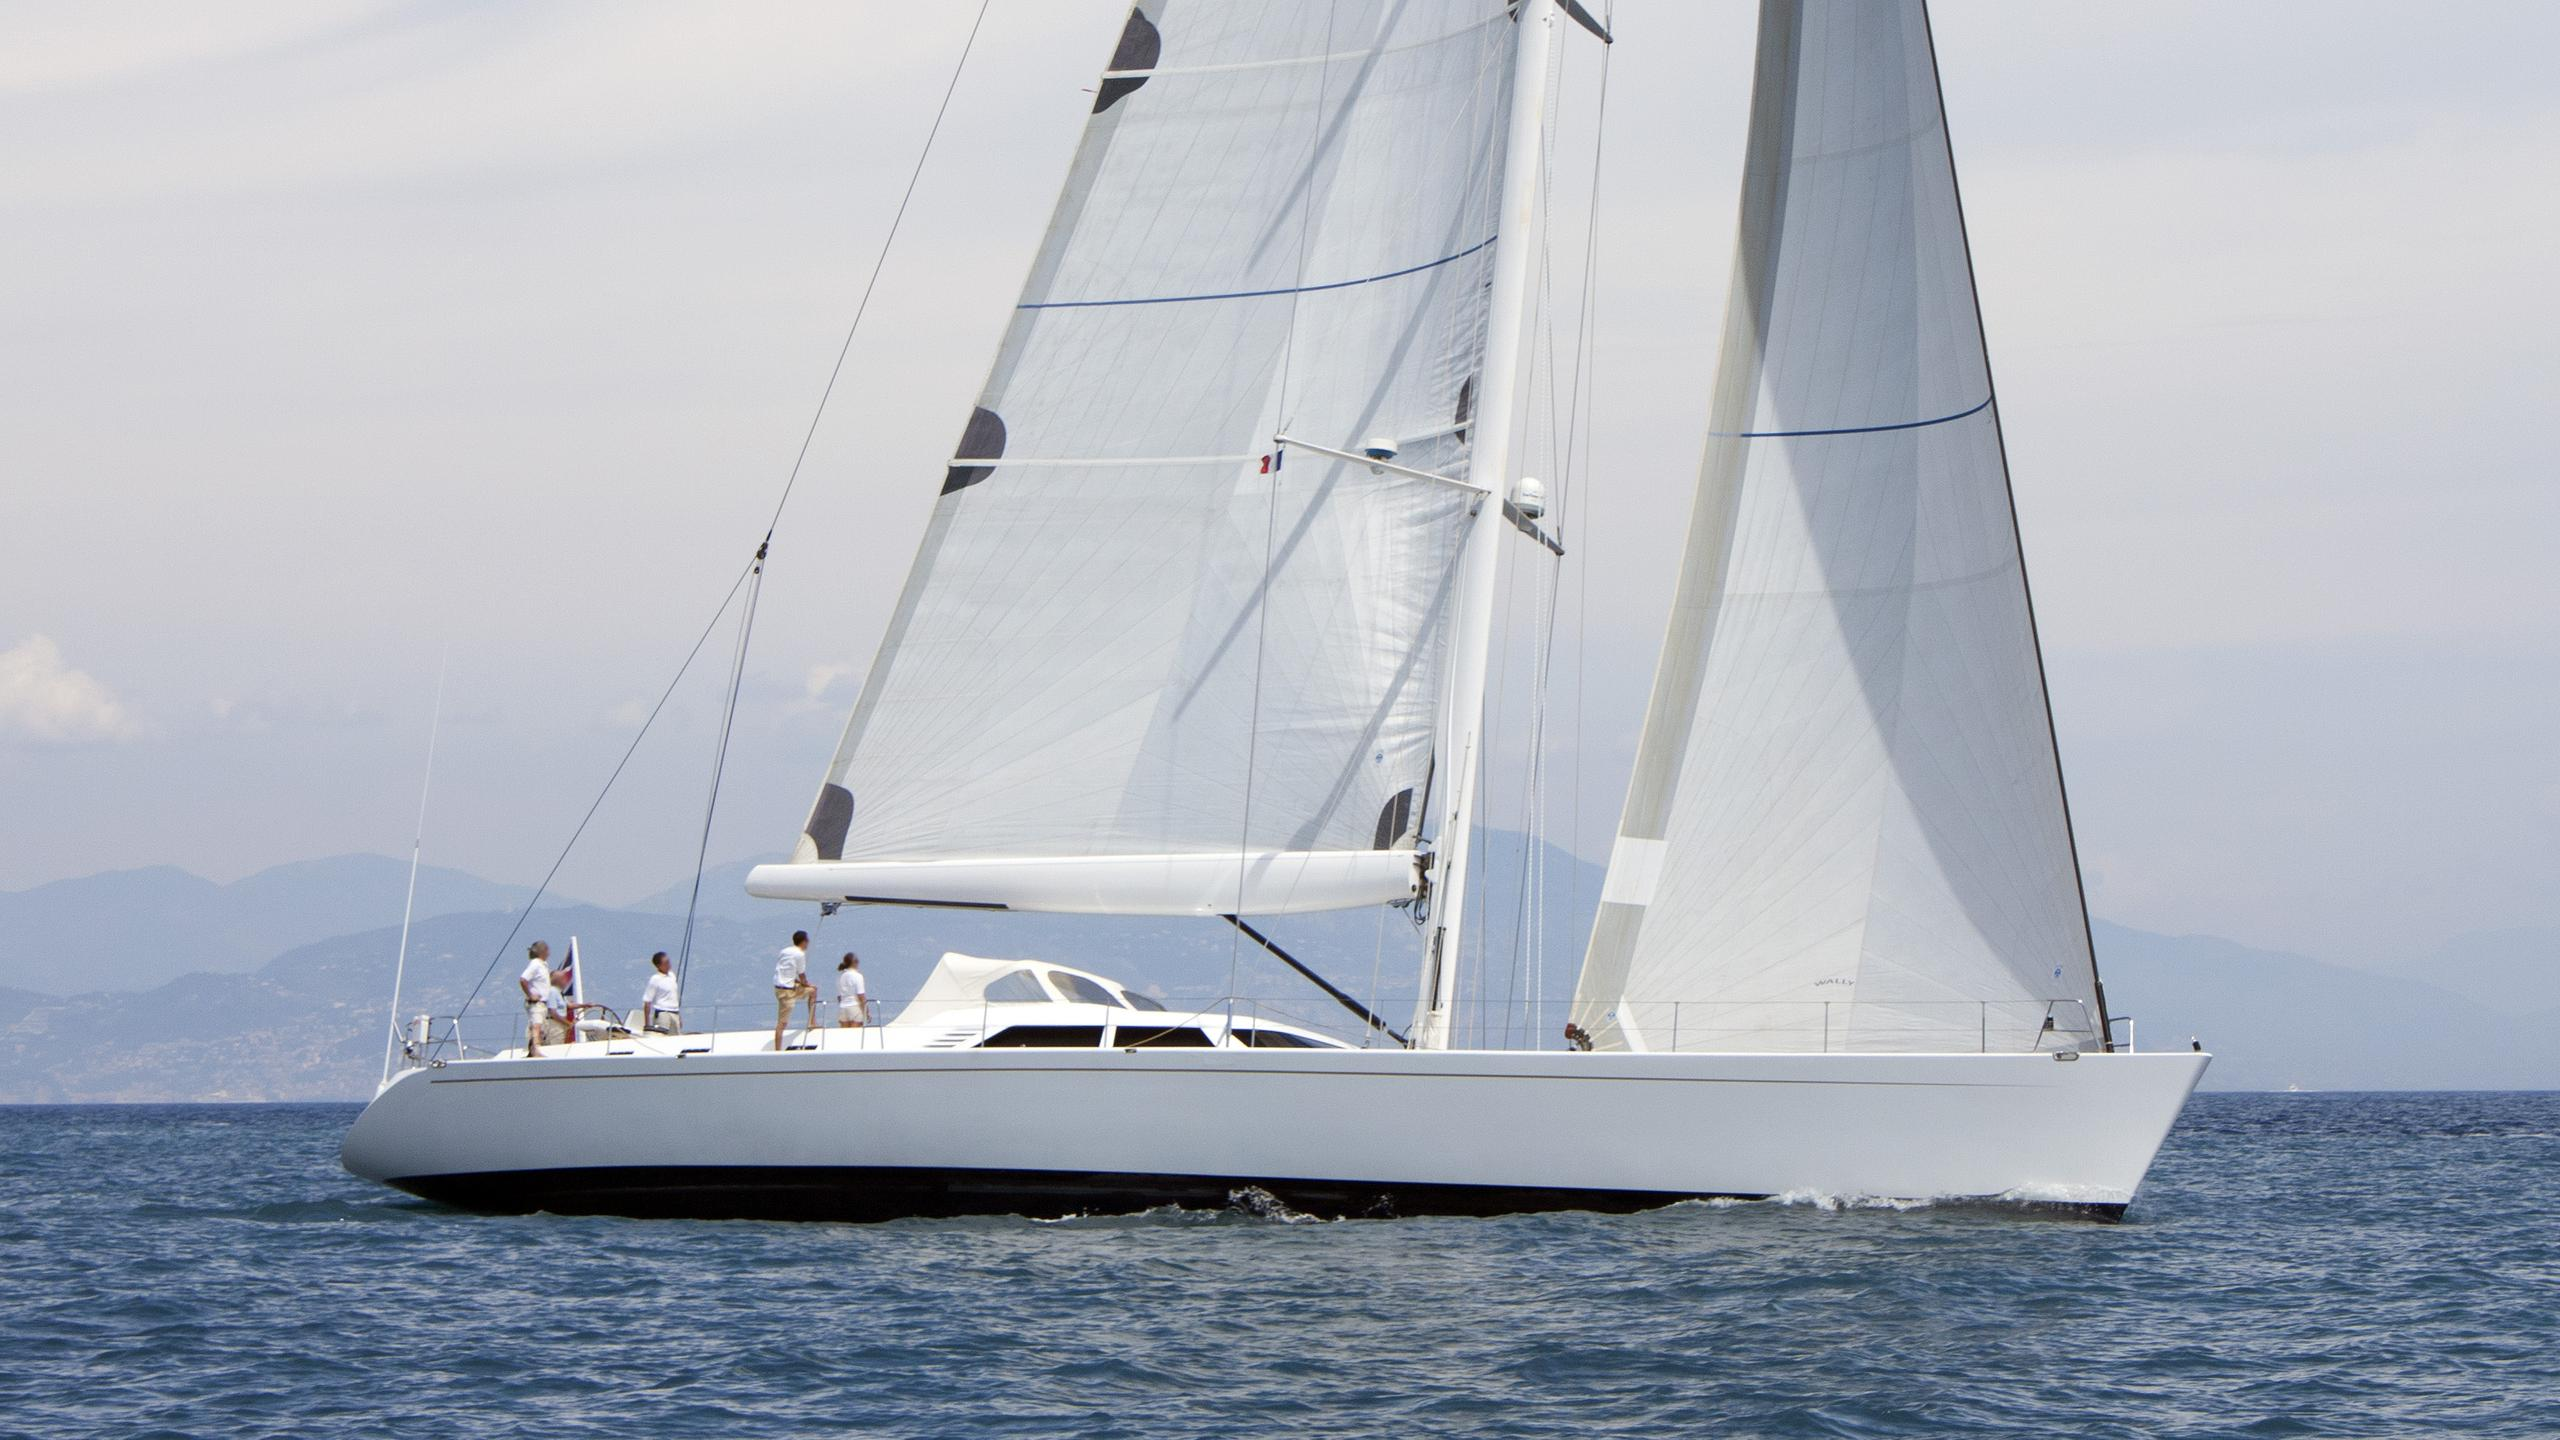 gibian-sailing-yacht-wally-100-2000-30m-profile-running